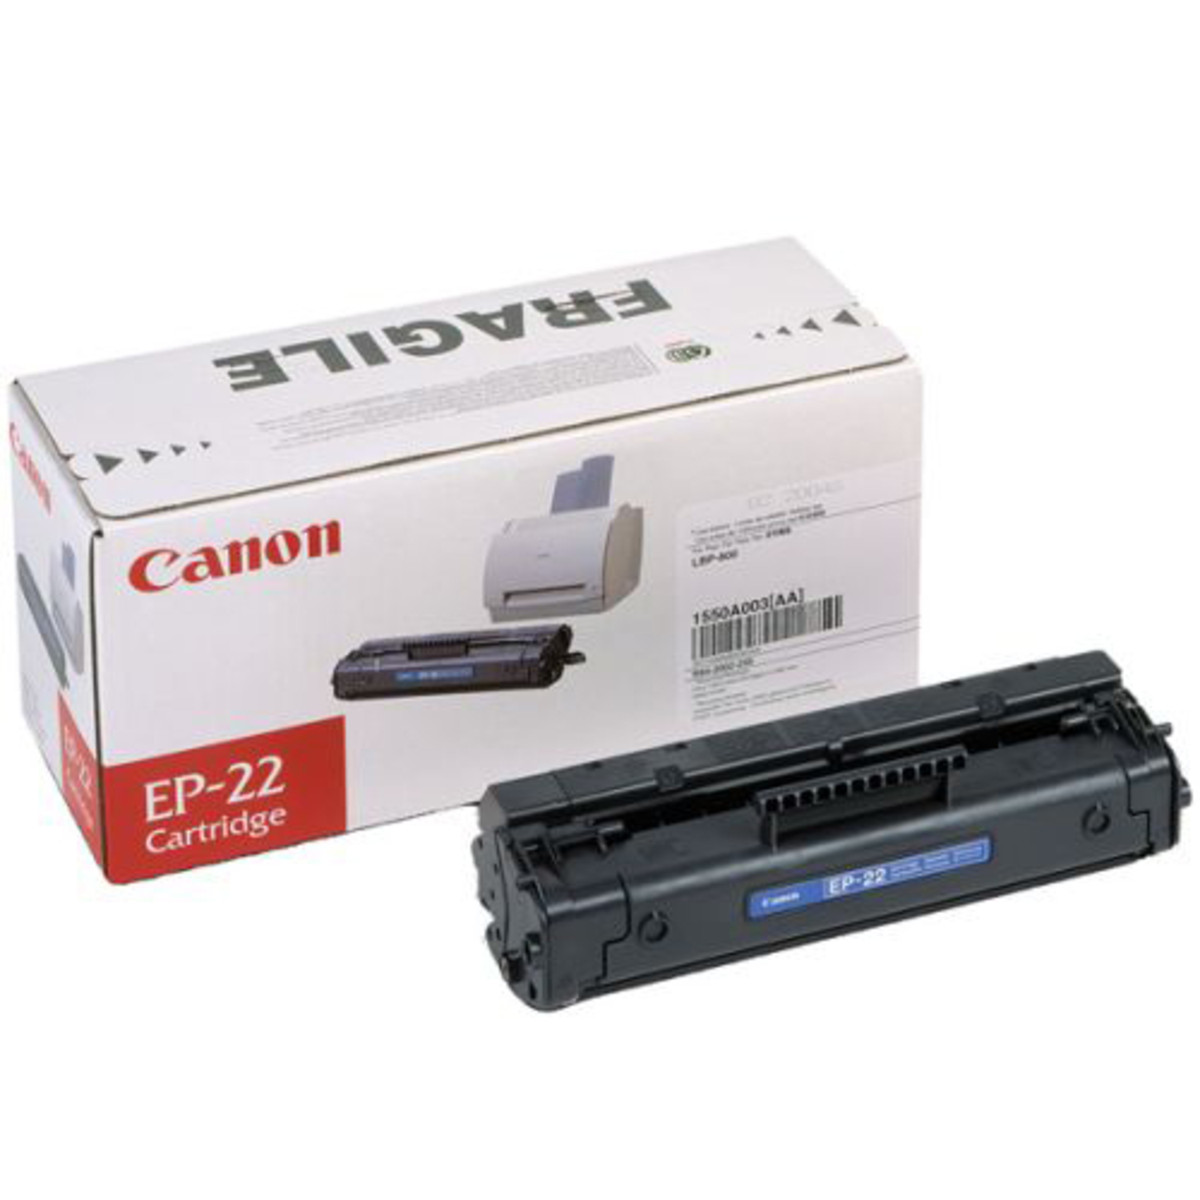 Canon EP-22 Black Toner Cartridge